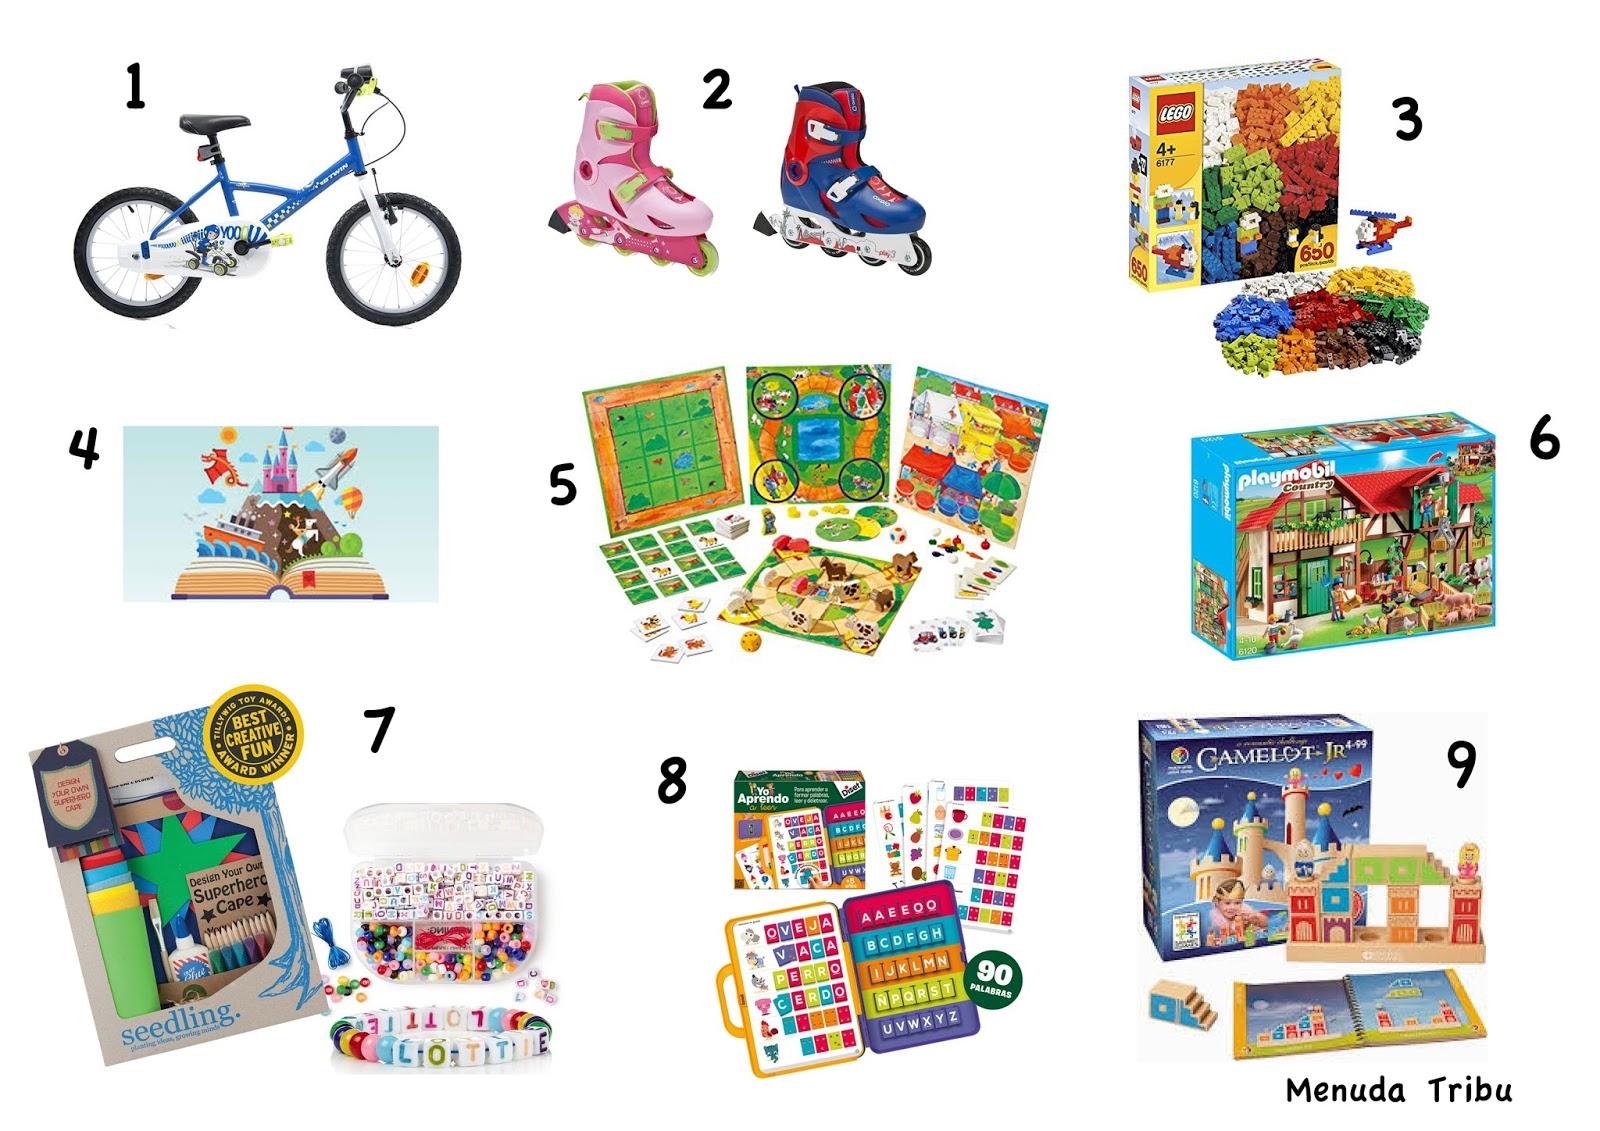 Menuda tribu ideas de juguetes para ni os de 4 5 a os - Juguetes para ninos de 3 a 4 anos ...